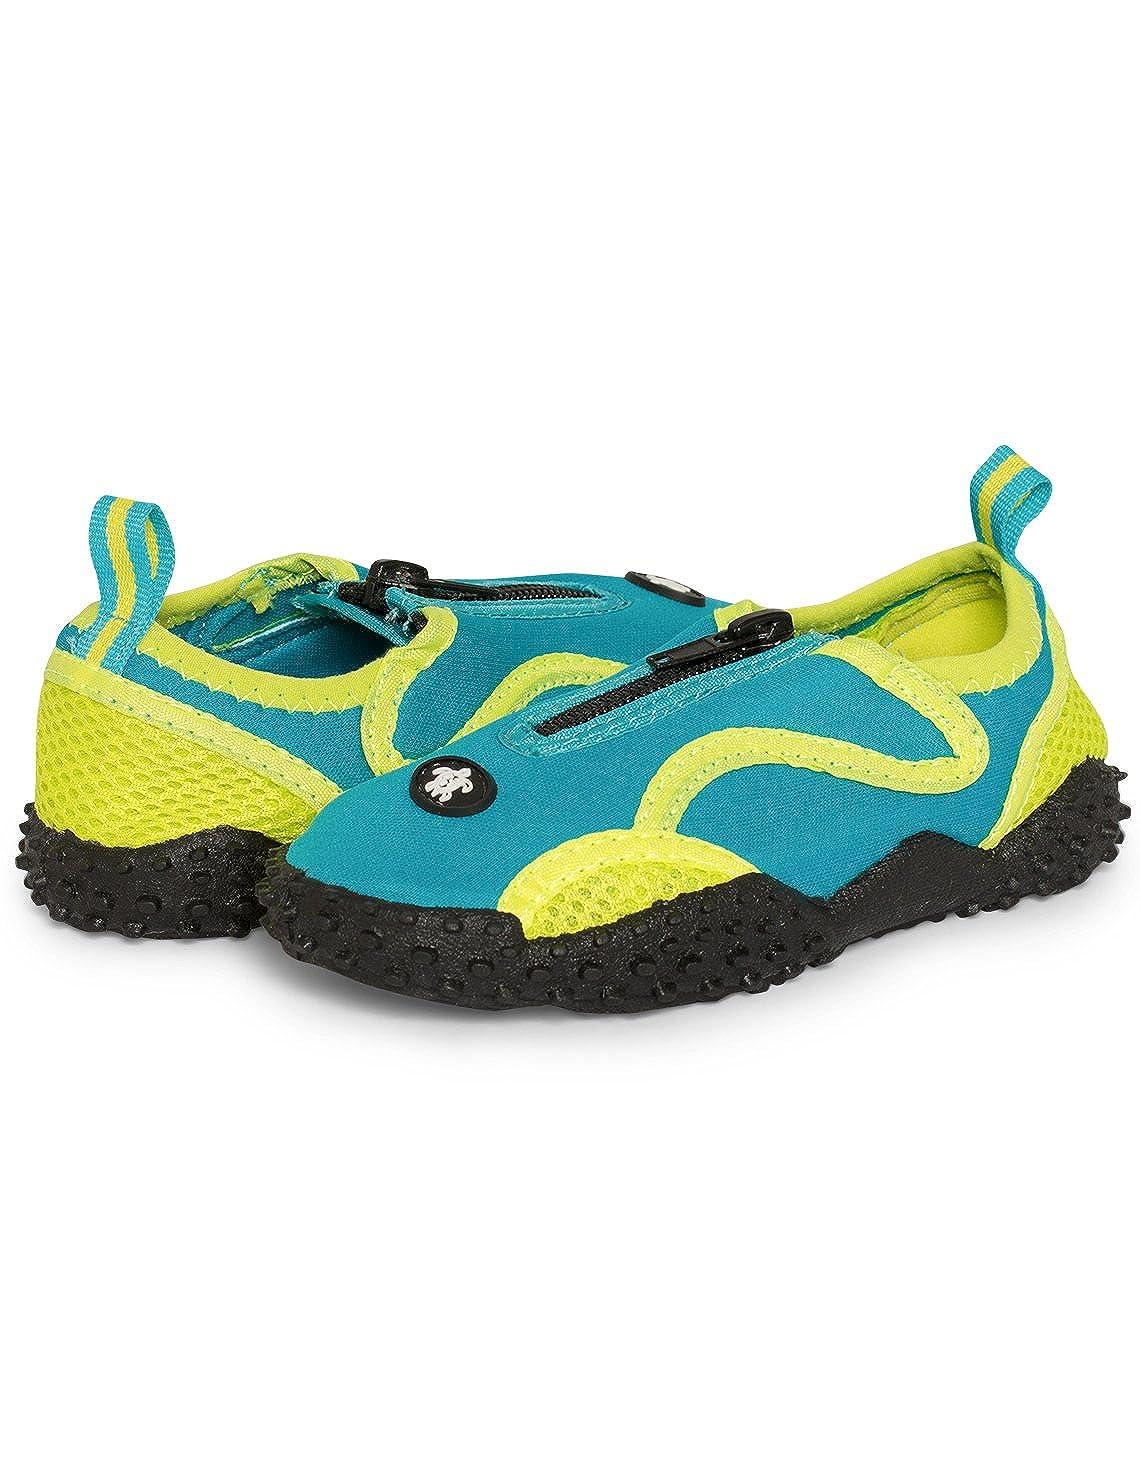 Tuga Kids Water Shoes (Boys/Girls/Infant/Toddler/Little Kid/Big Kid)